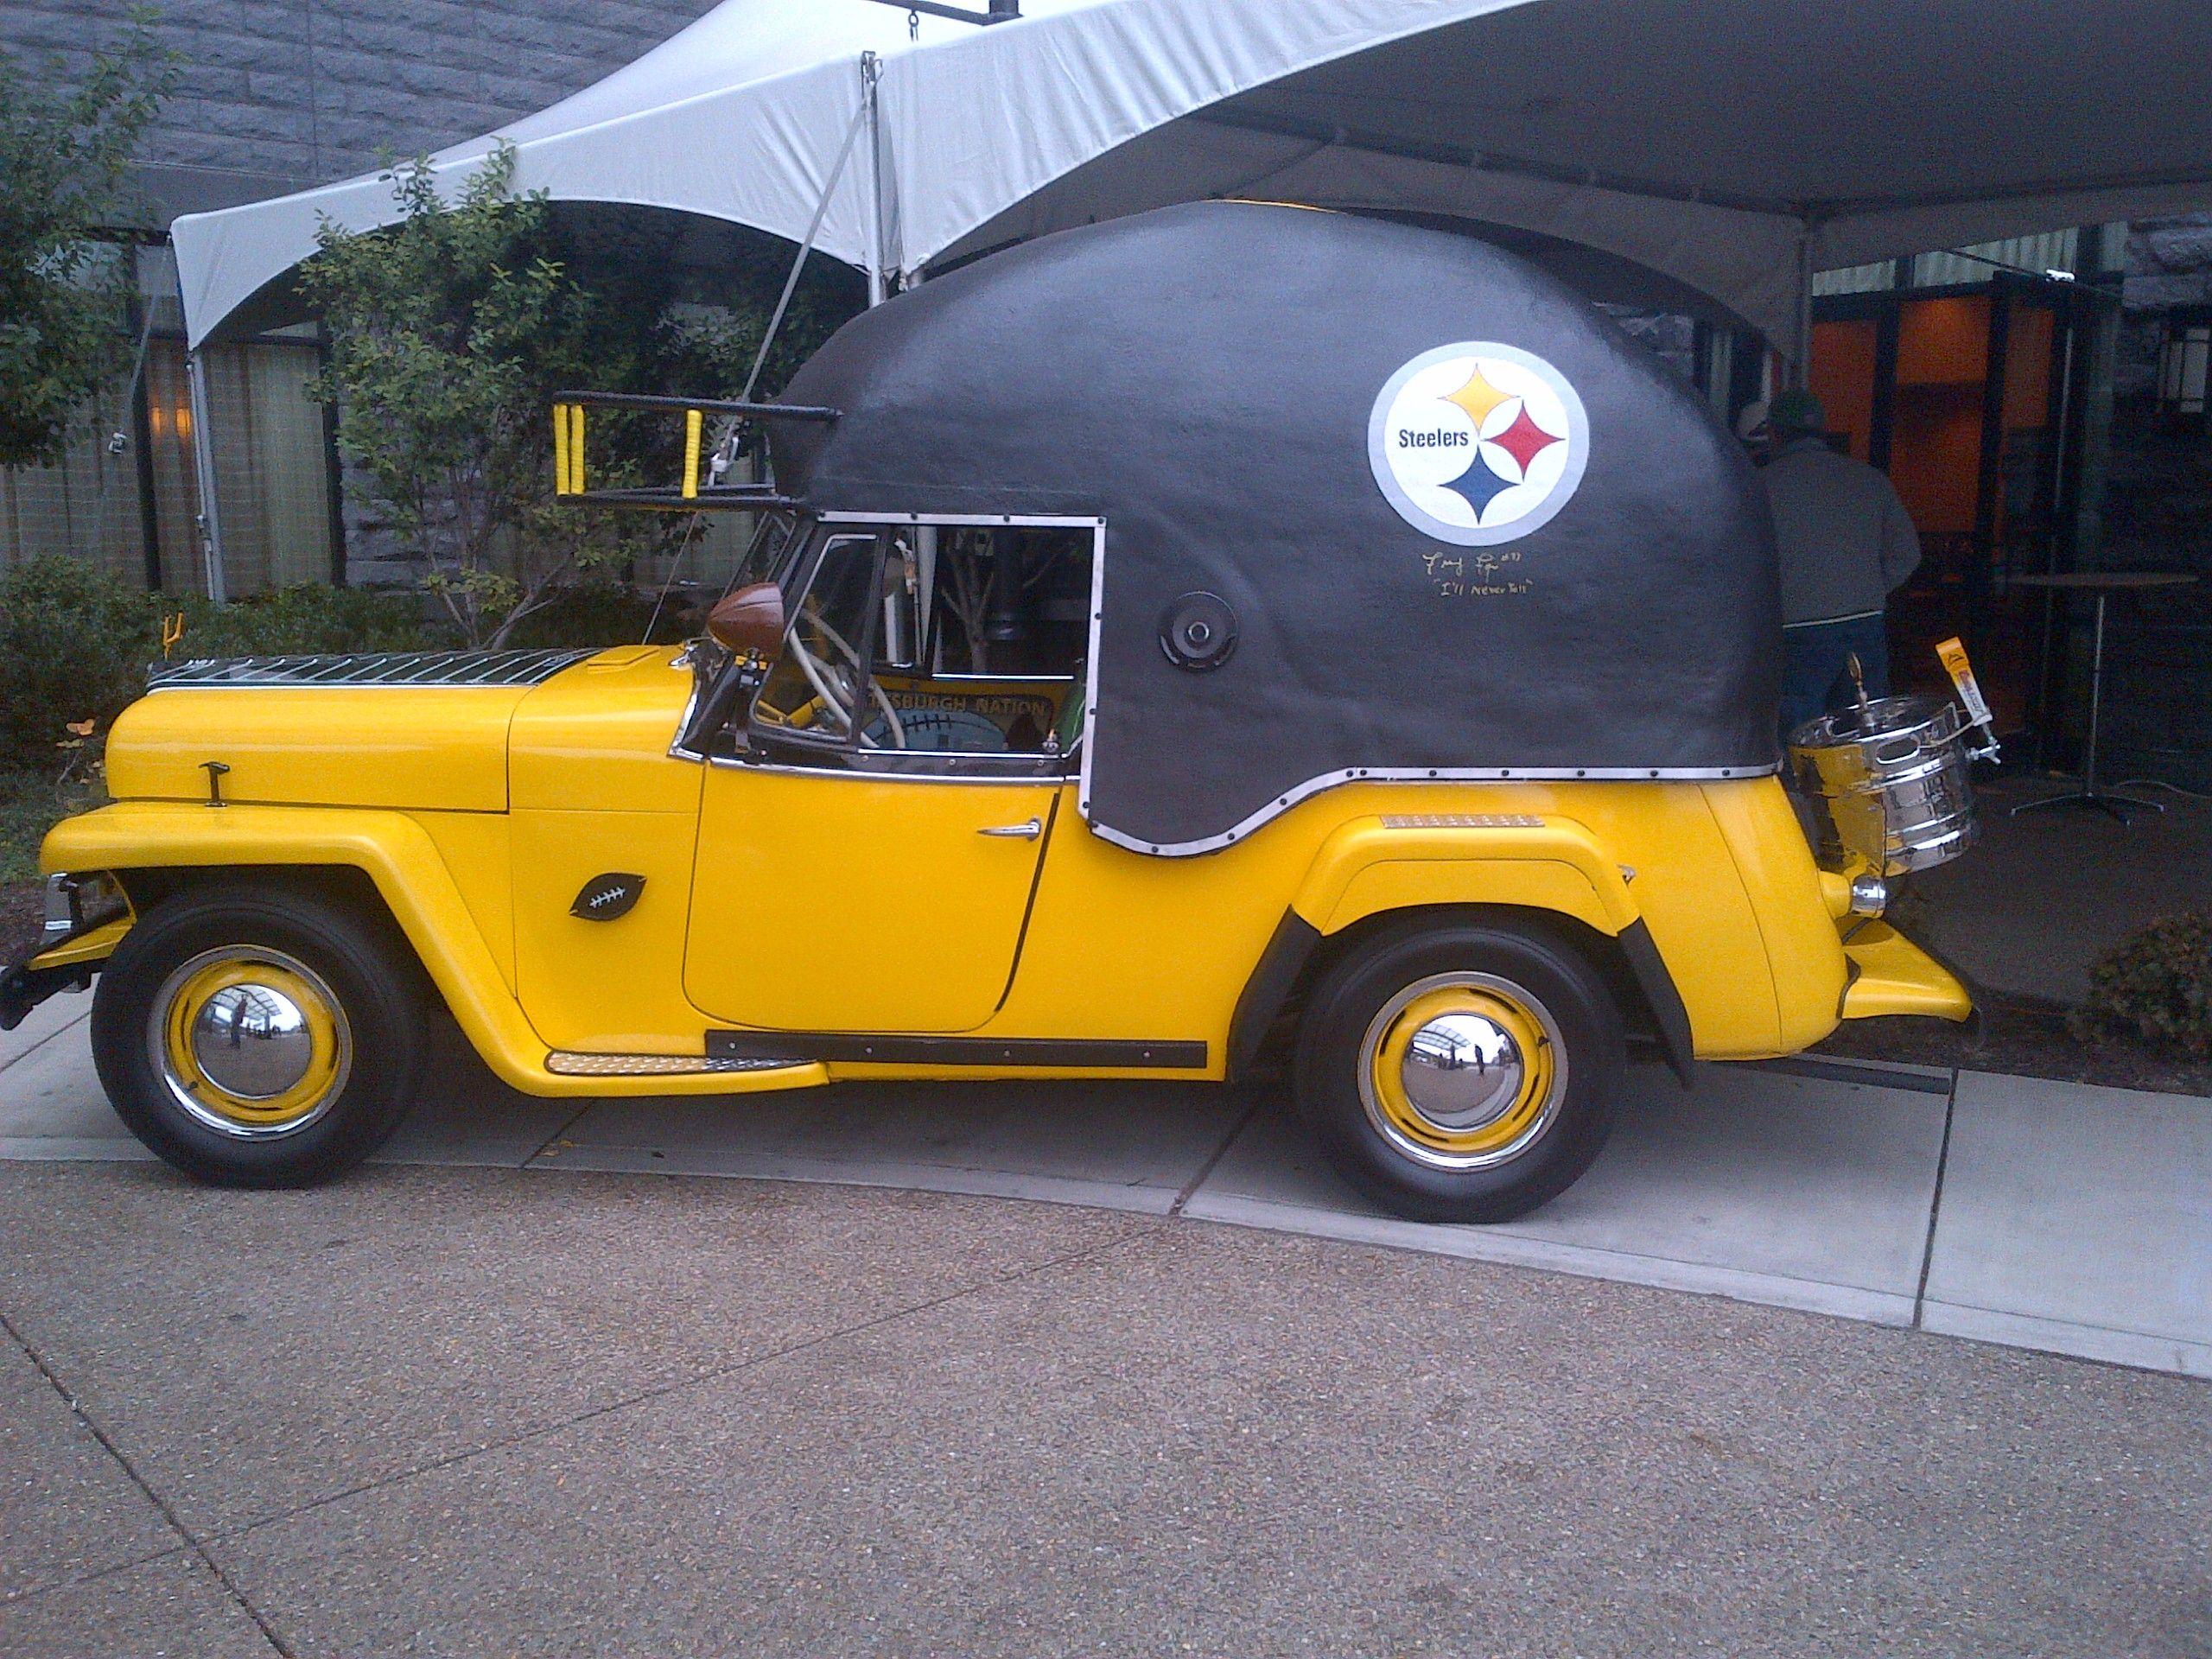 Pittsburgh Steelers NFL 8 Inch Car Magnet �C Fan Shop HQ ...